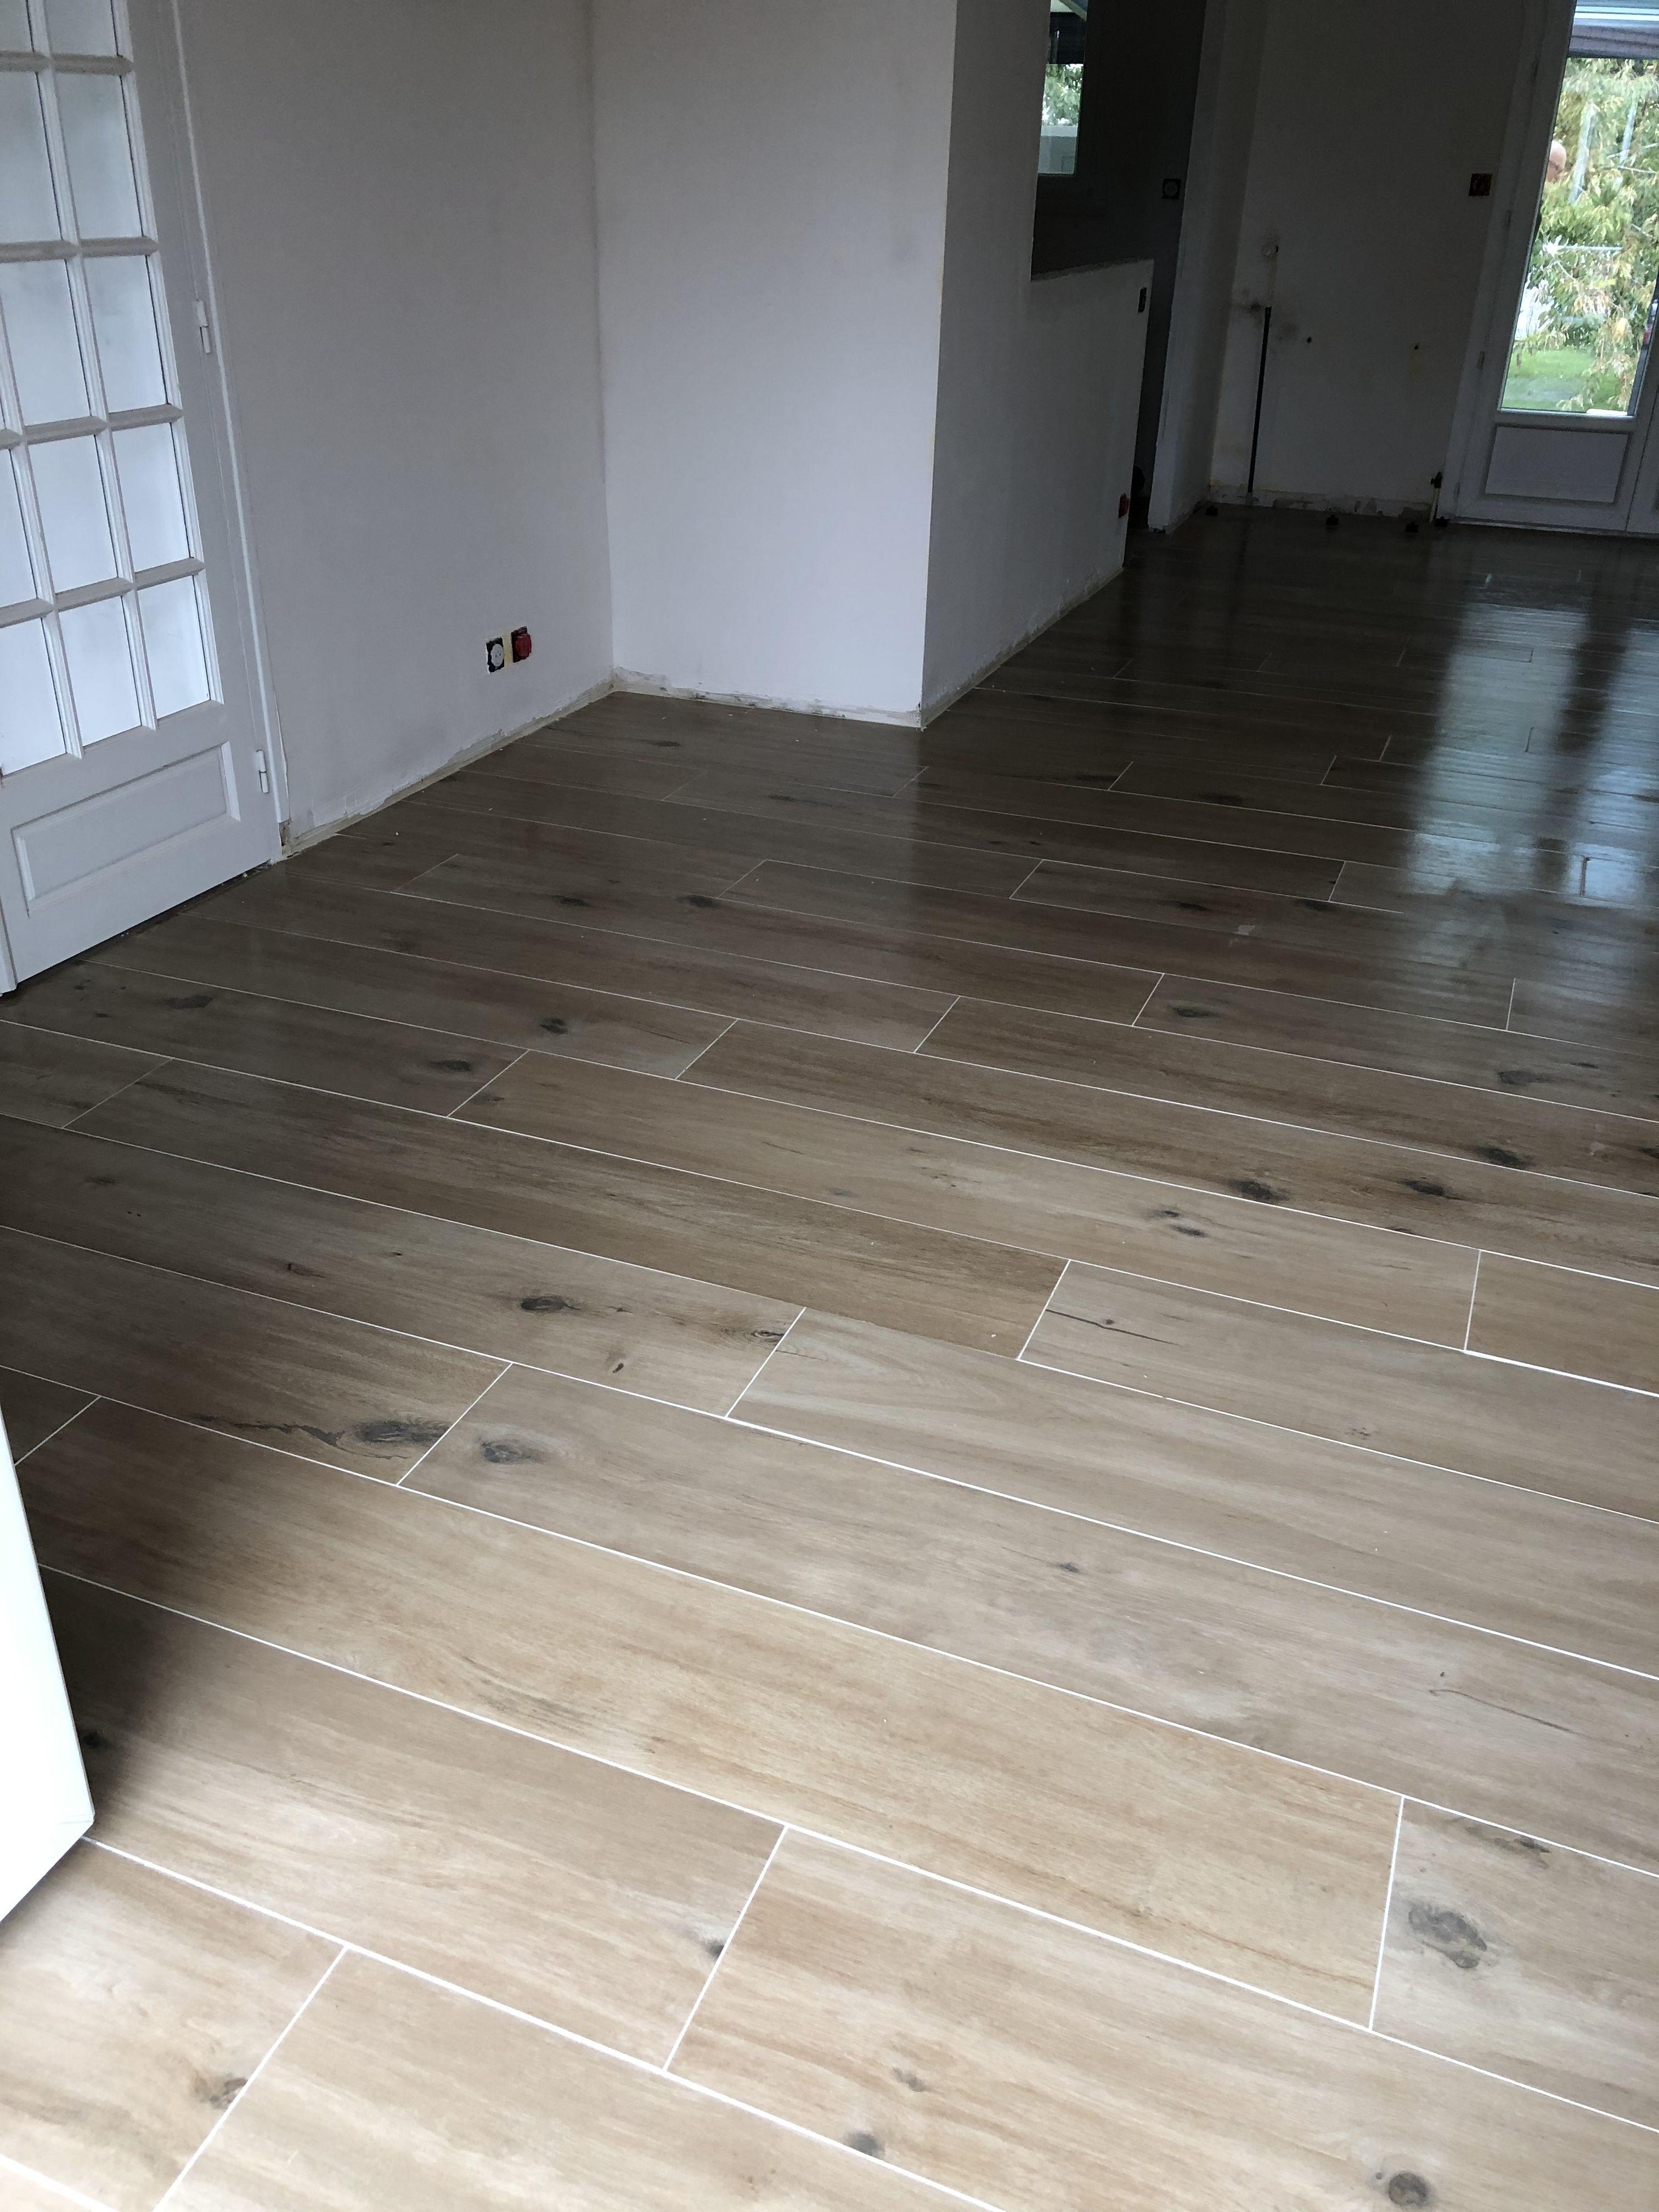 Best Of Pose Carrelage Imitation Parquet Sens Tile Floor Flooring